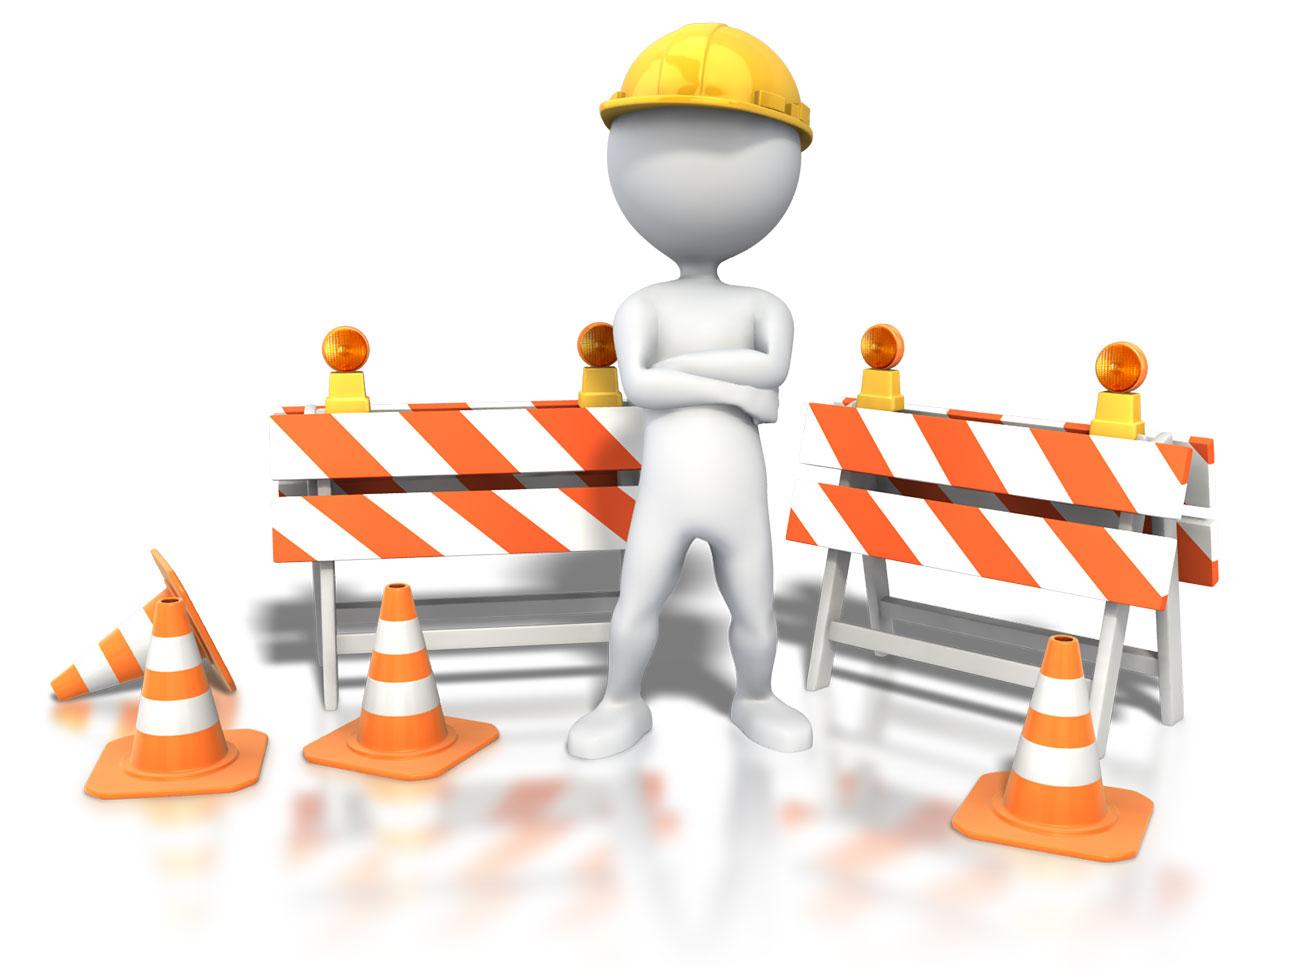 common sense and accident prevention